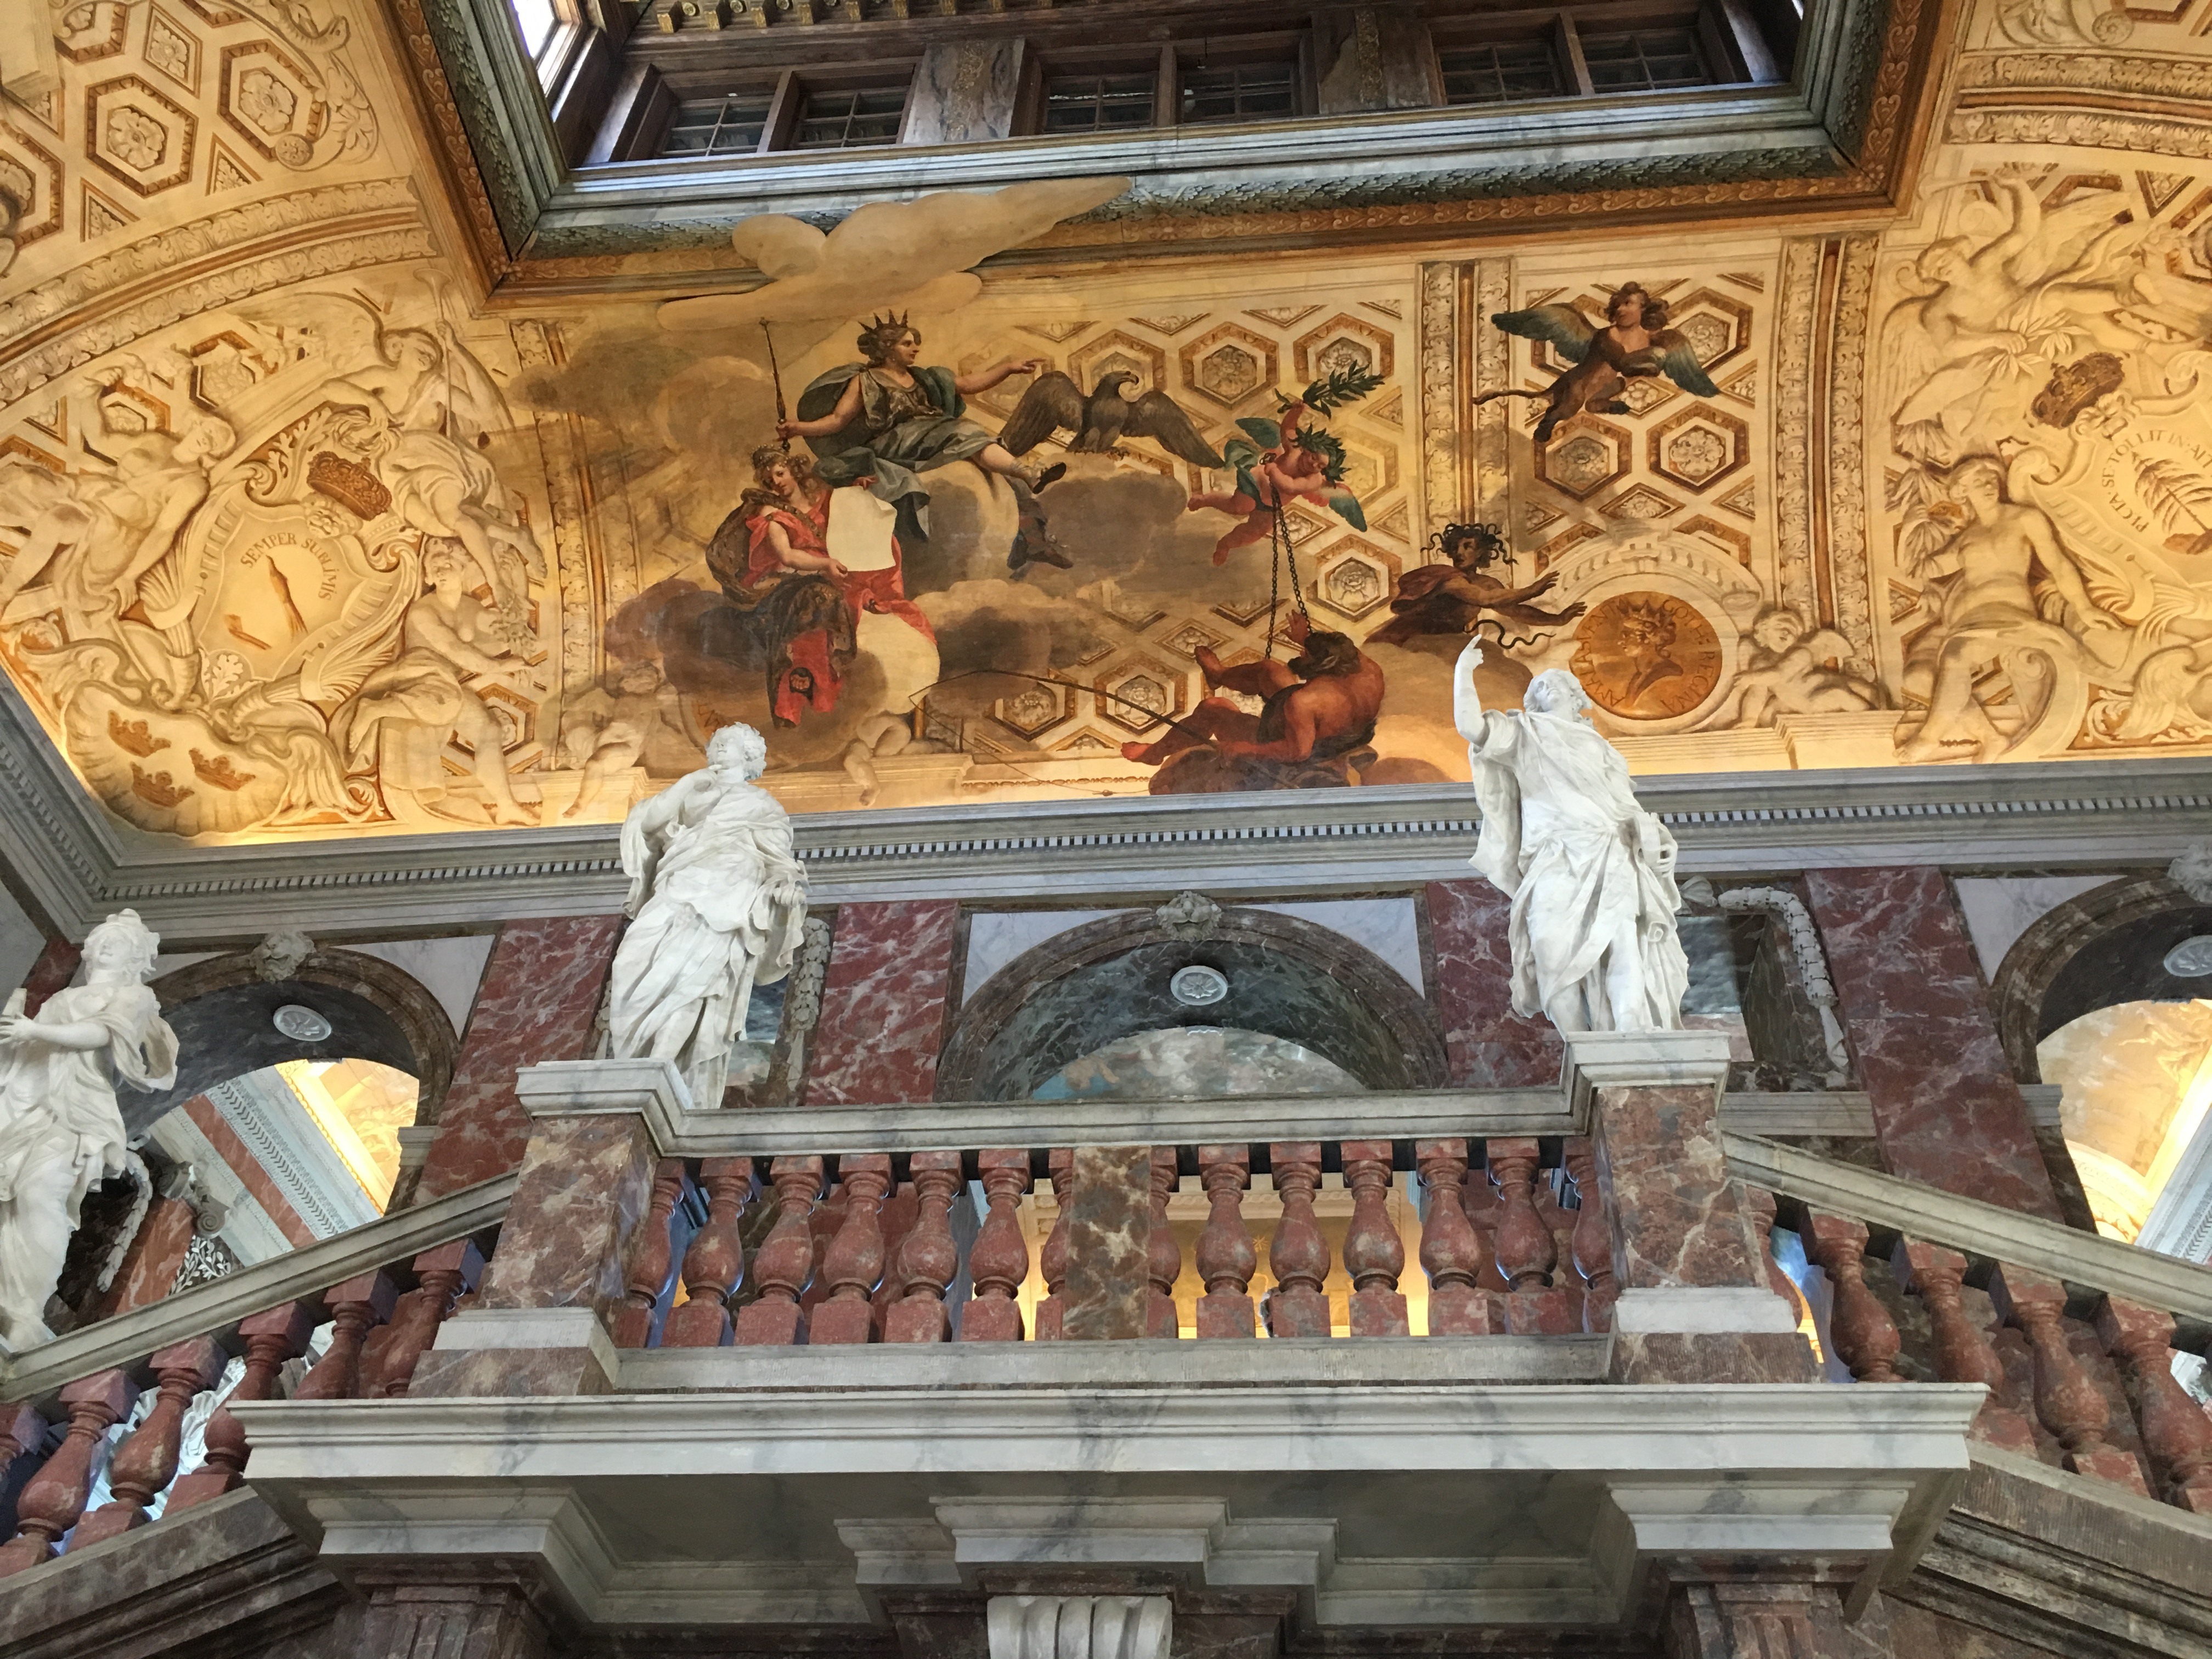 Una gita al palazzo di Drottningholm - gli interni